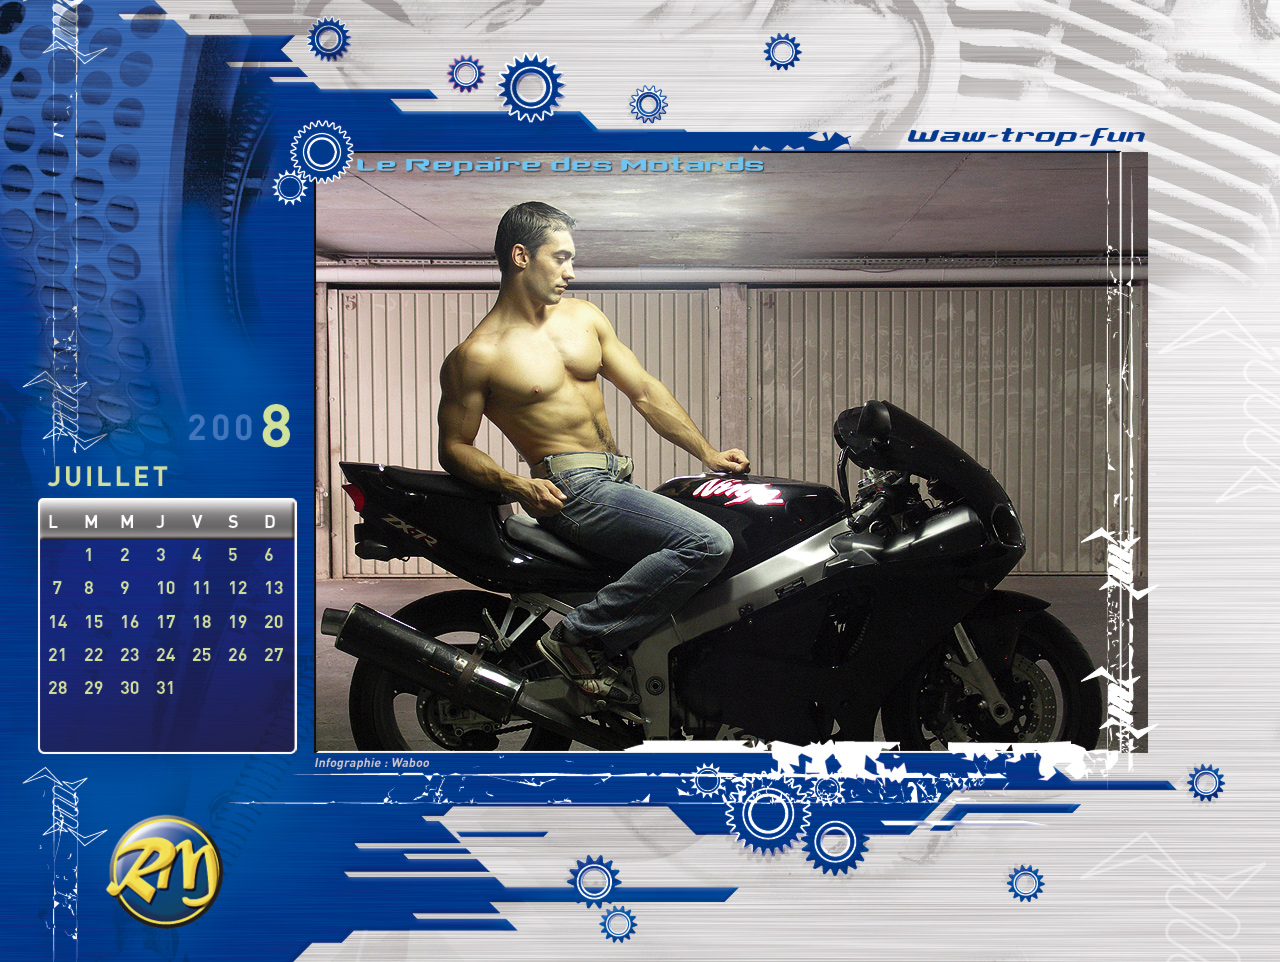 Beaux mecs en moto - Page 2 Juillet2008_